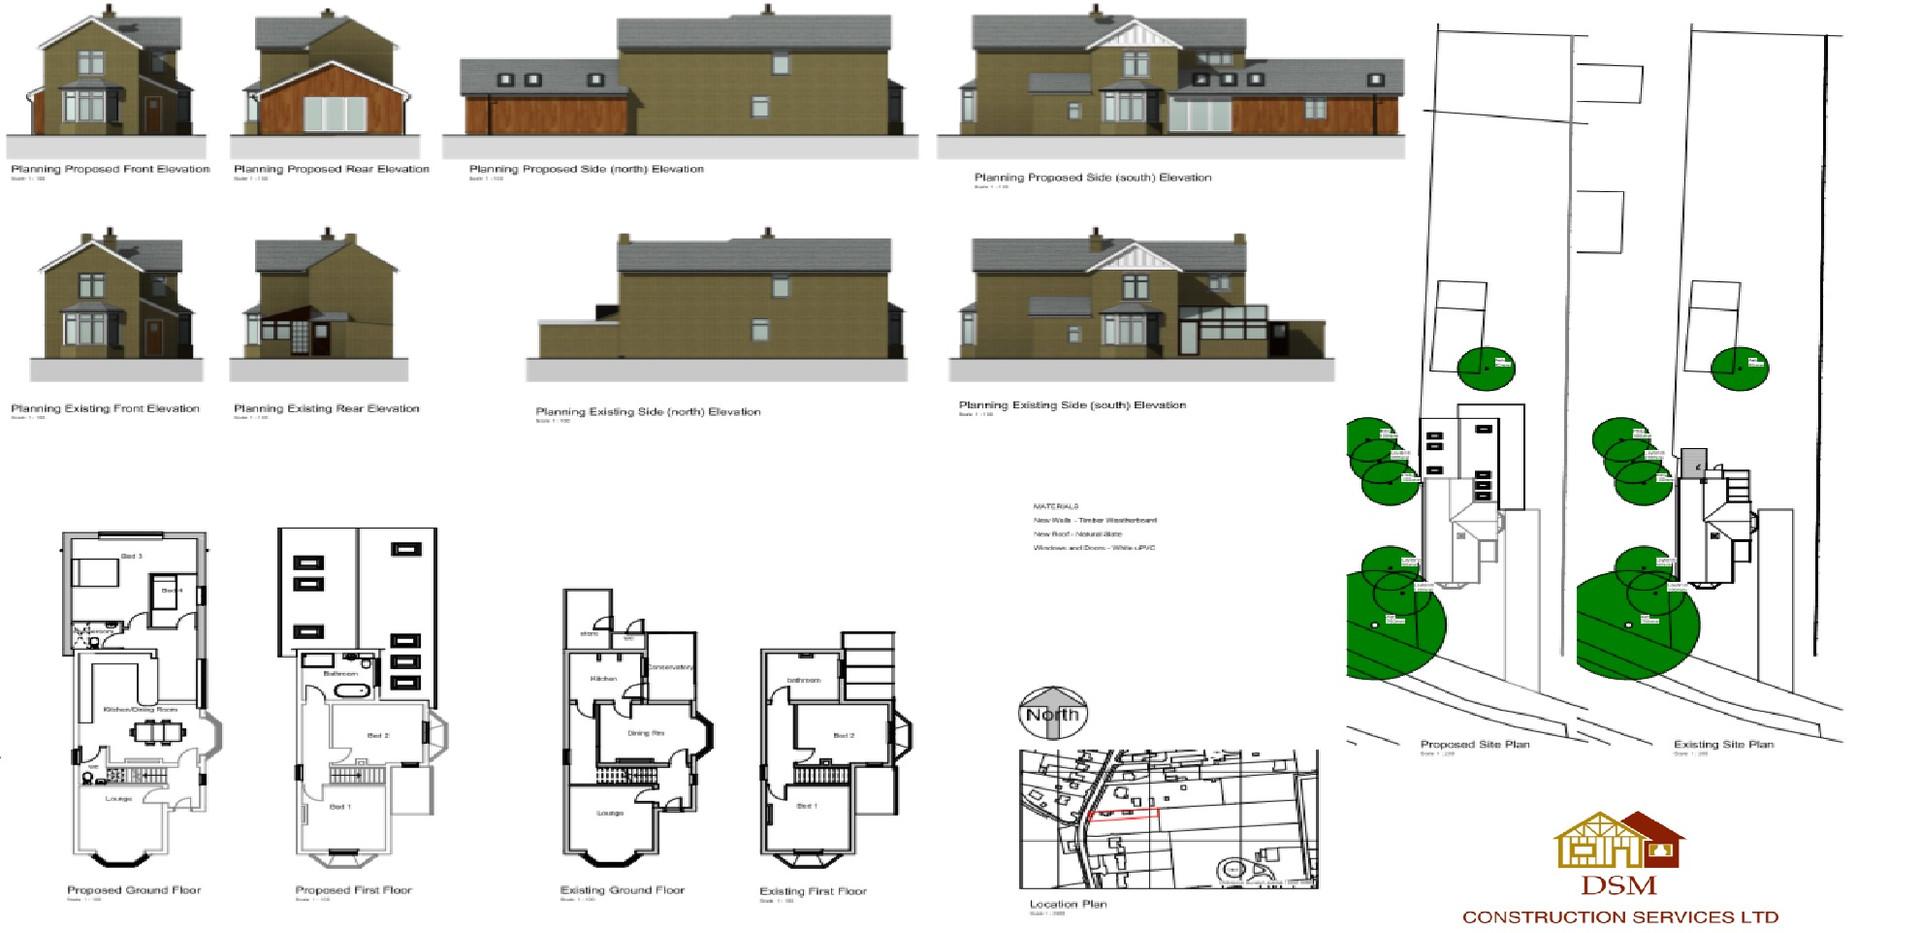 March extension plans 2